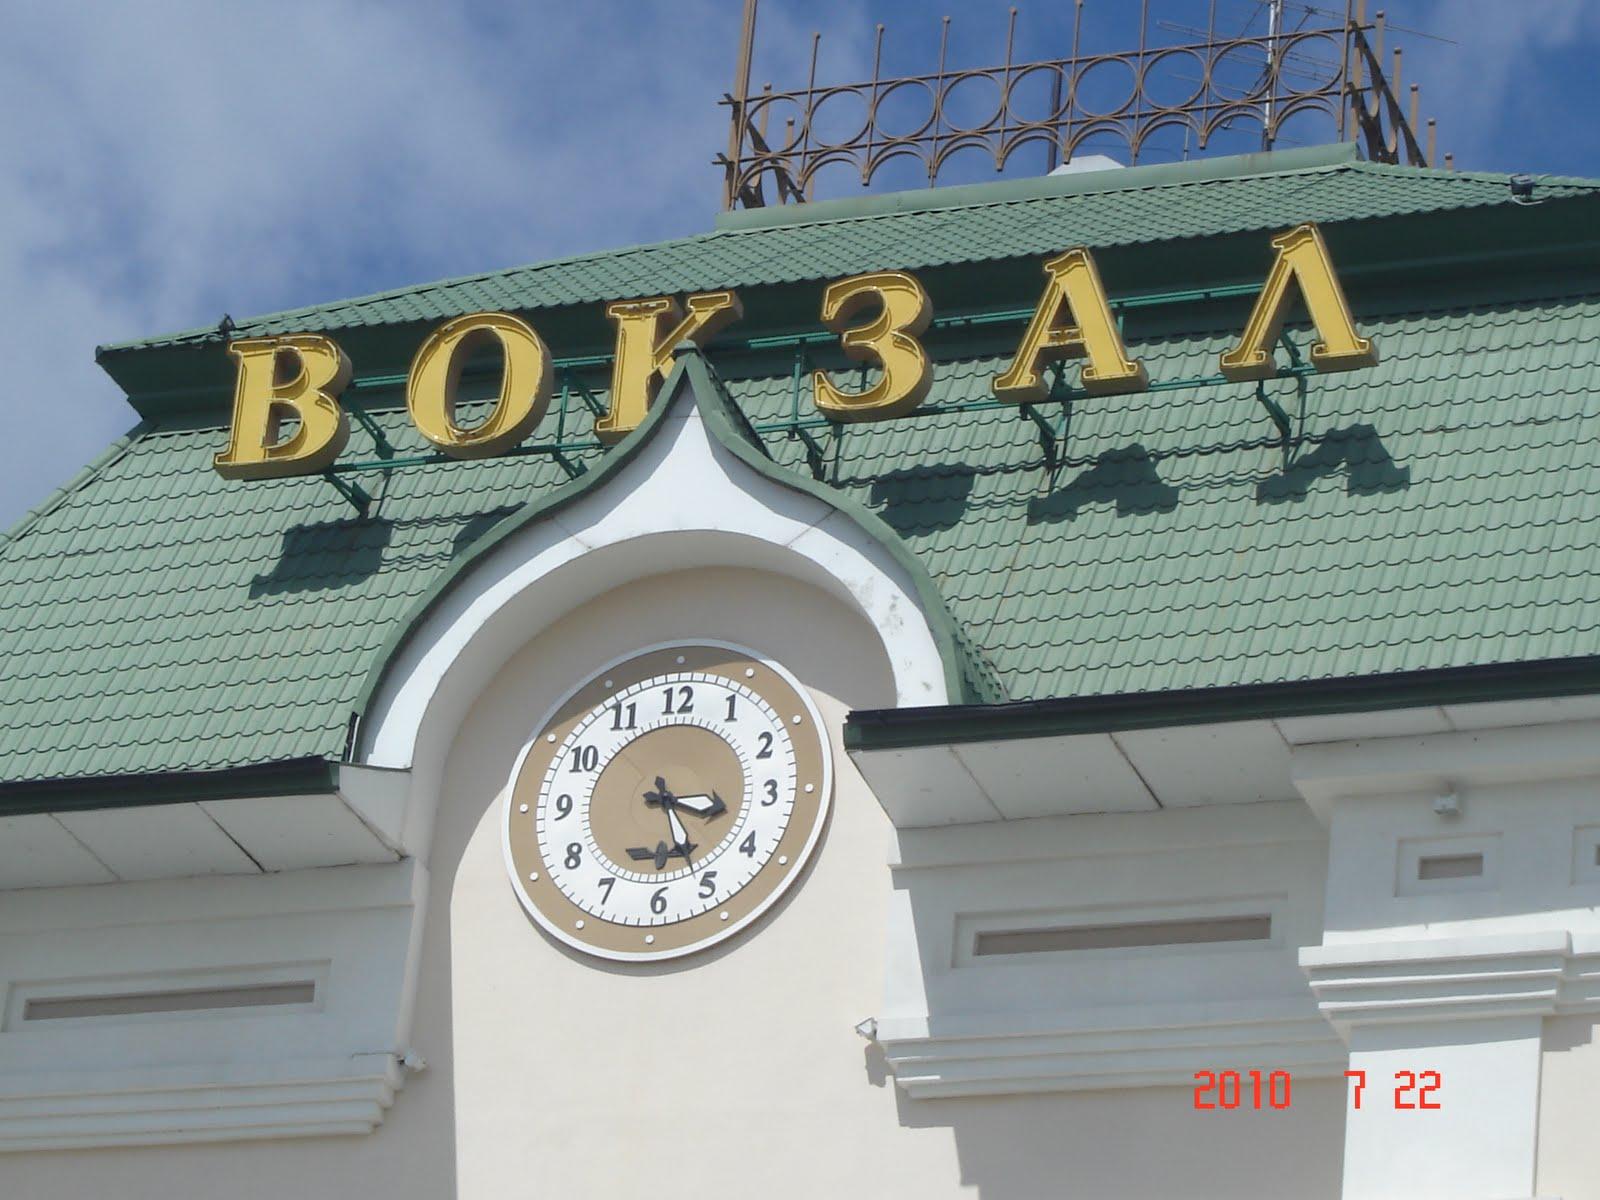 vse-konchaetsya-konchaetsya-konchaetsya-minusovka